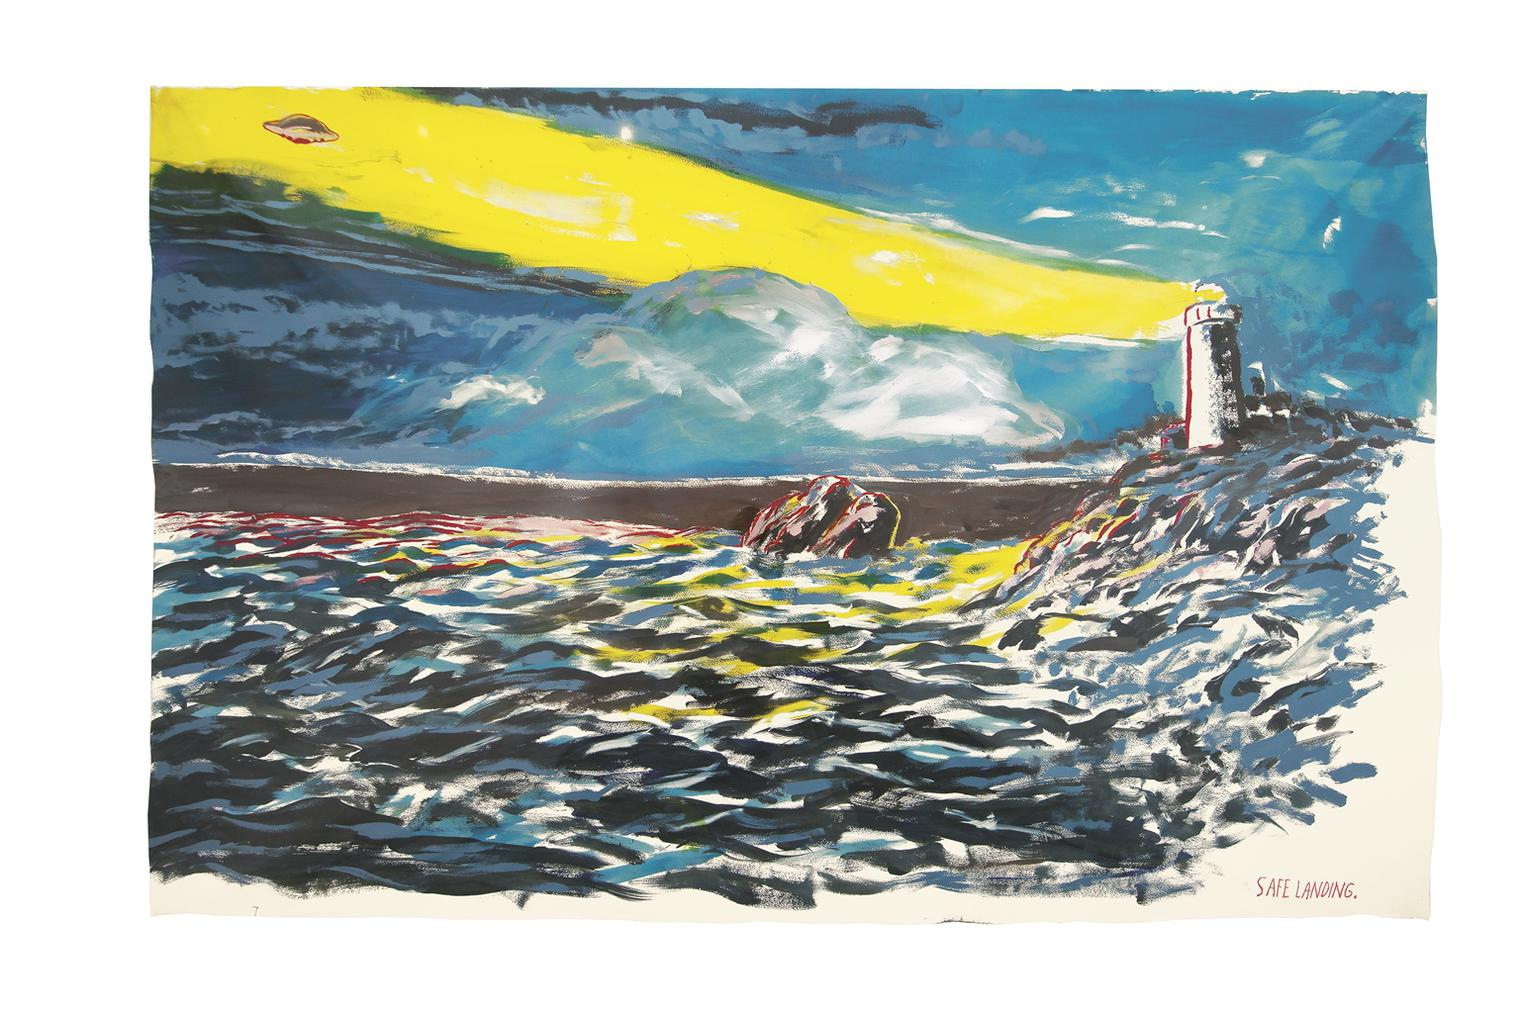 Raymond Pettibon-No Title (Safe Landing...)-2014